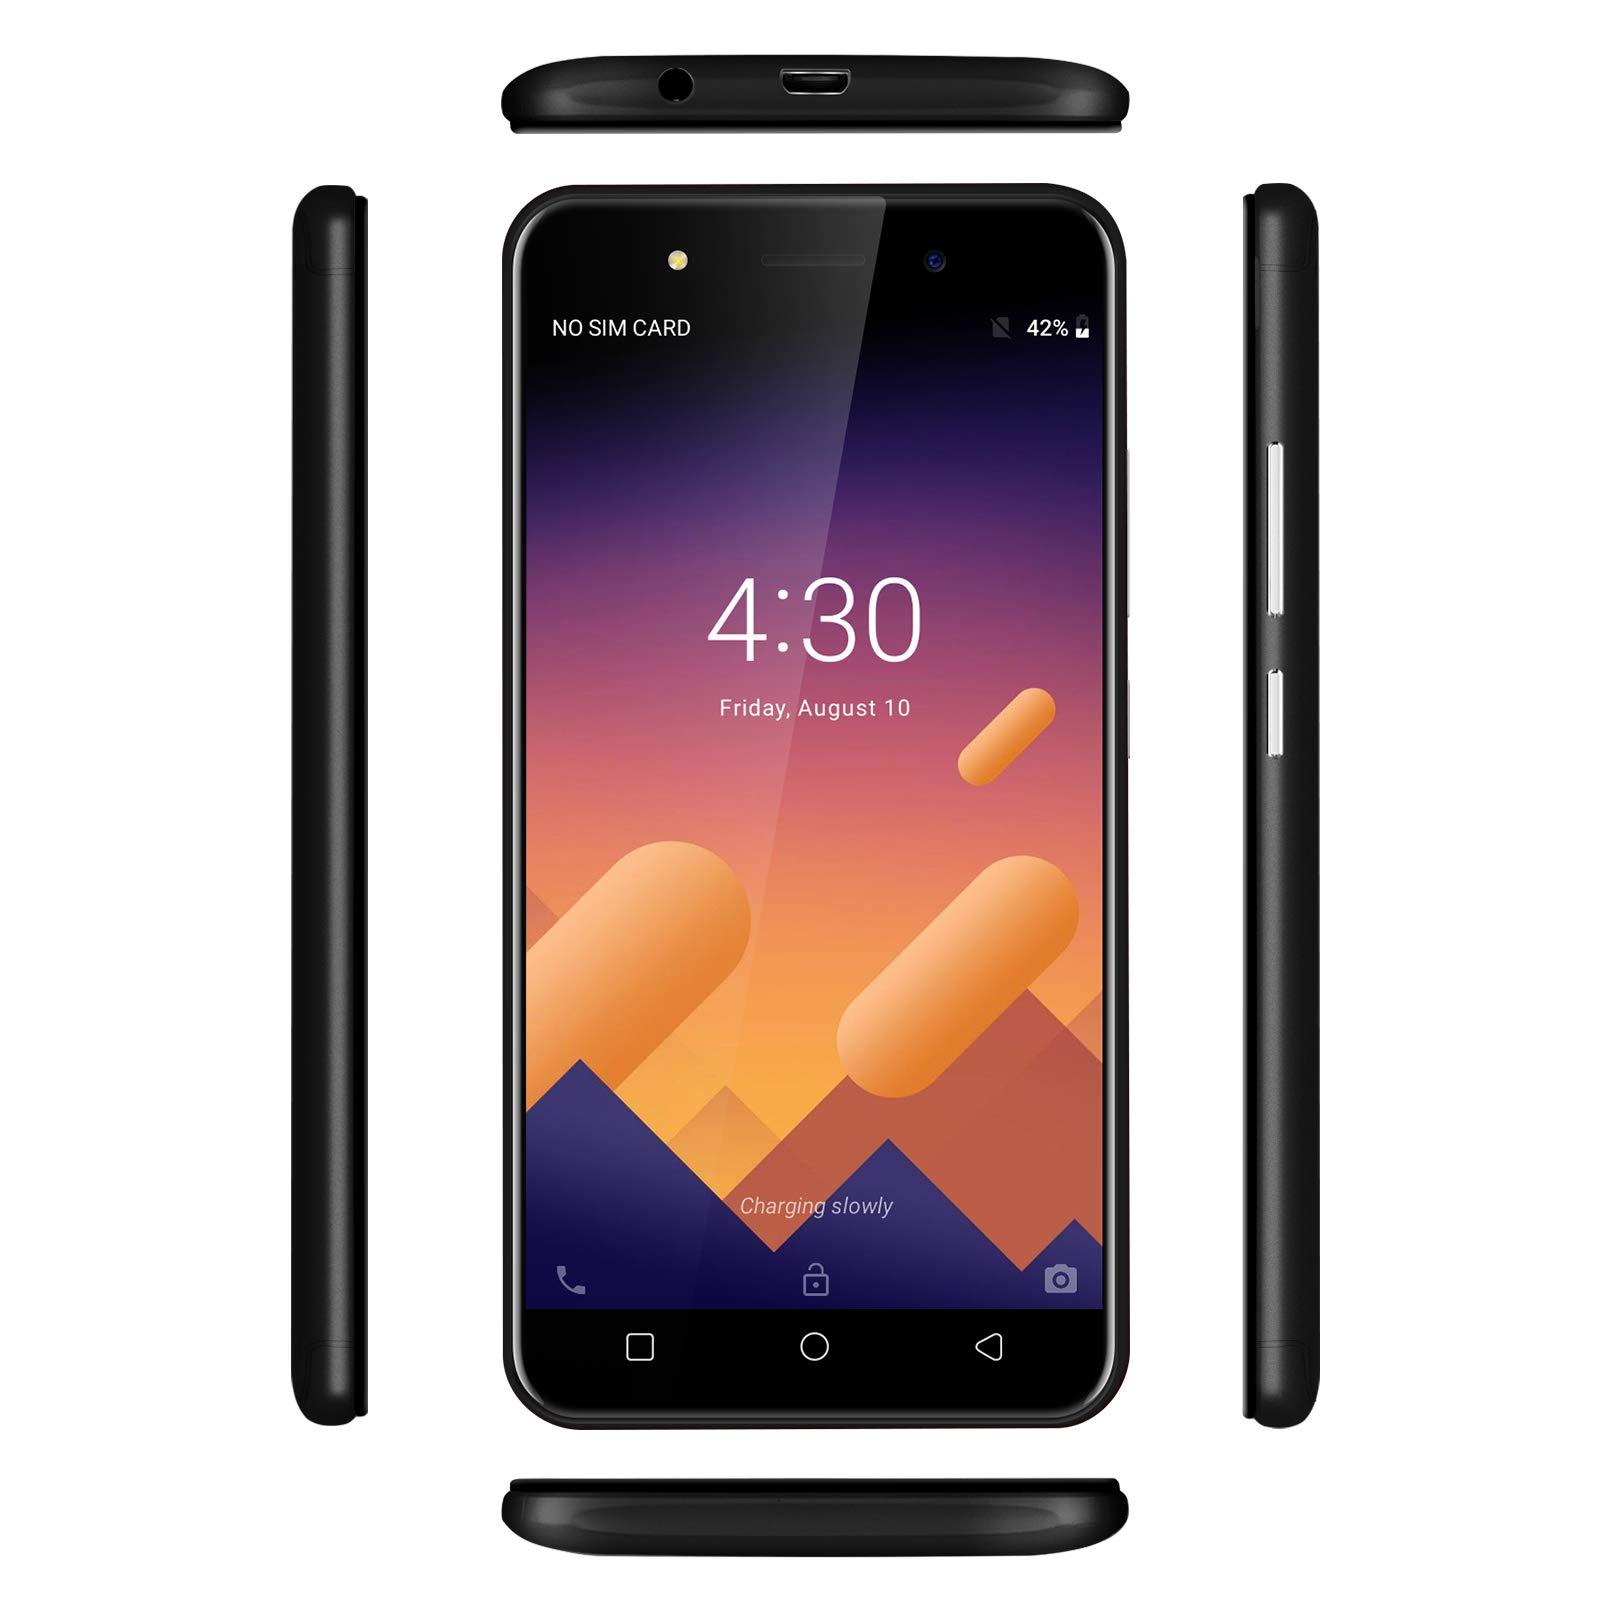 Xgody X6 Android Go 8.1 Smartphone Unlocked, 5 Inch Sim Free ...